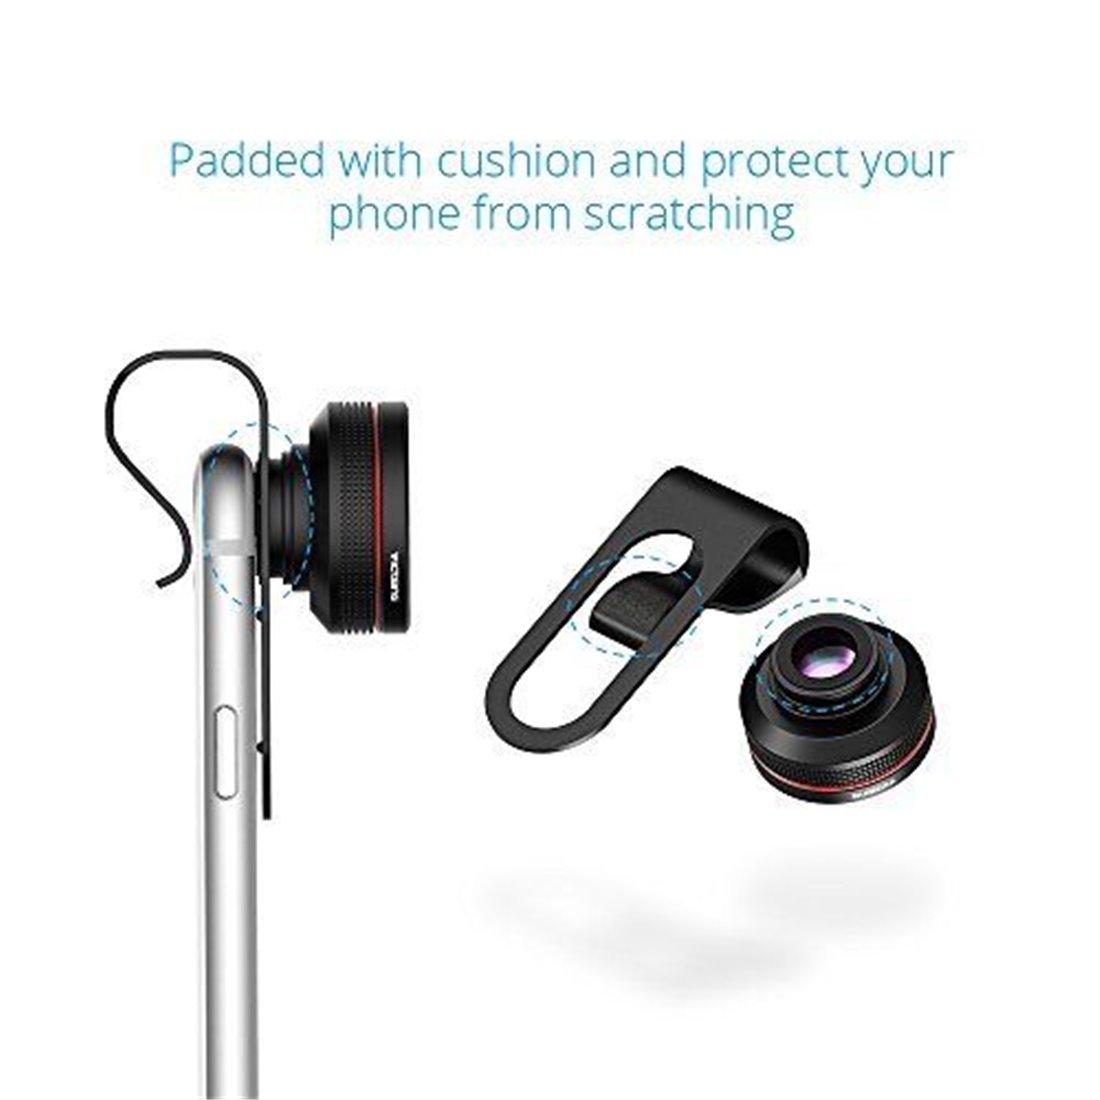 3 en 1 Kit Objectif Téléphone Universel VicTsing Objectif Smartphone Fisheye Suprême 180°+ 12x Objectif Macro + 24x Super Mac